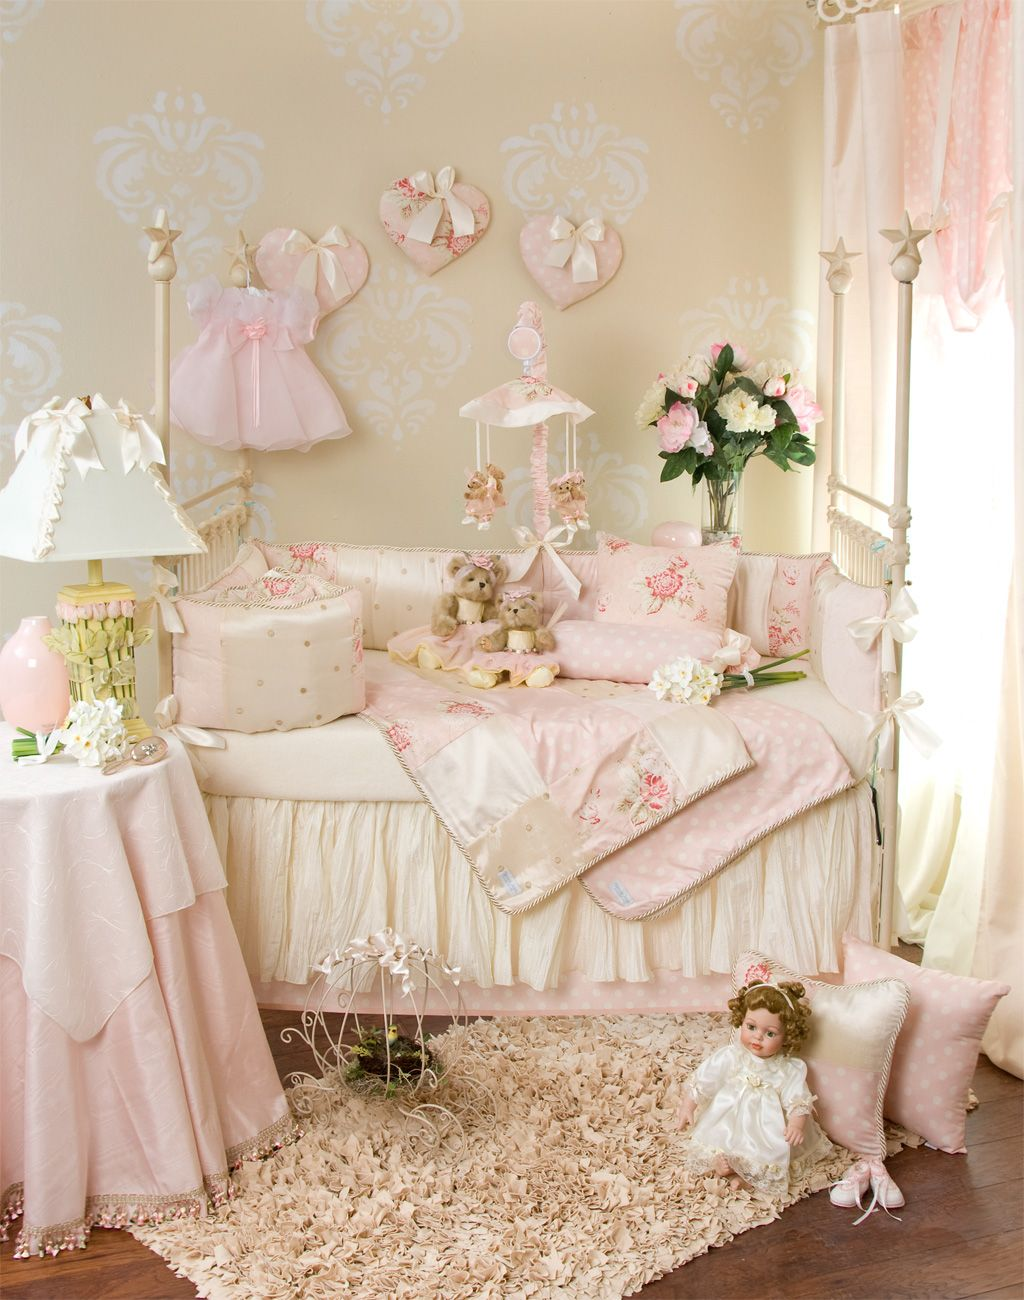 Shabby chic wall decor nursery - Glenna Jean Bedding For Baby Girl S Room With Shabby Chic Flair Via Baby Cribs